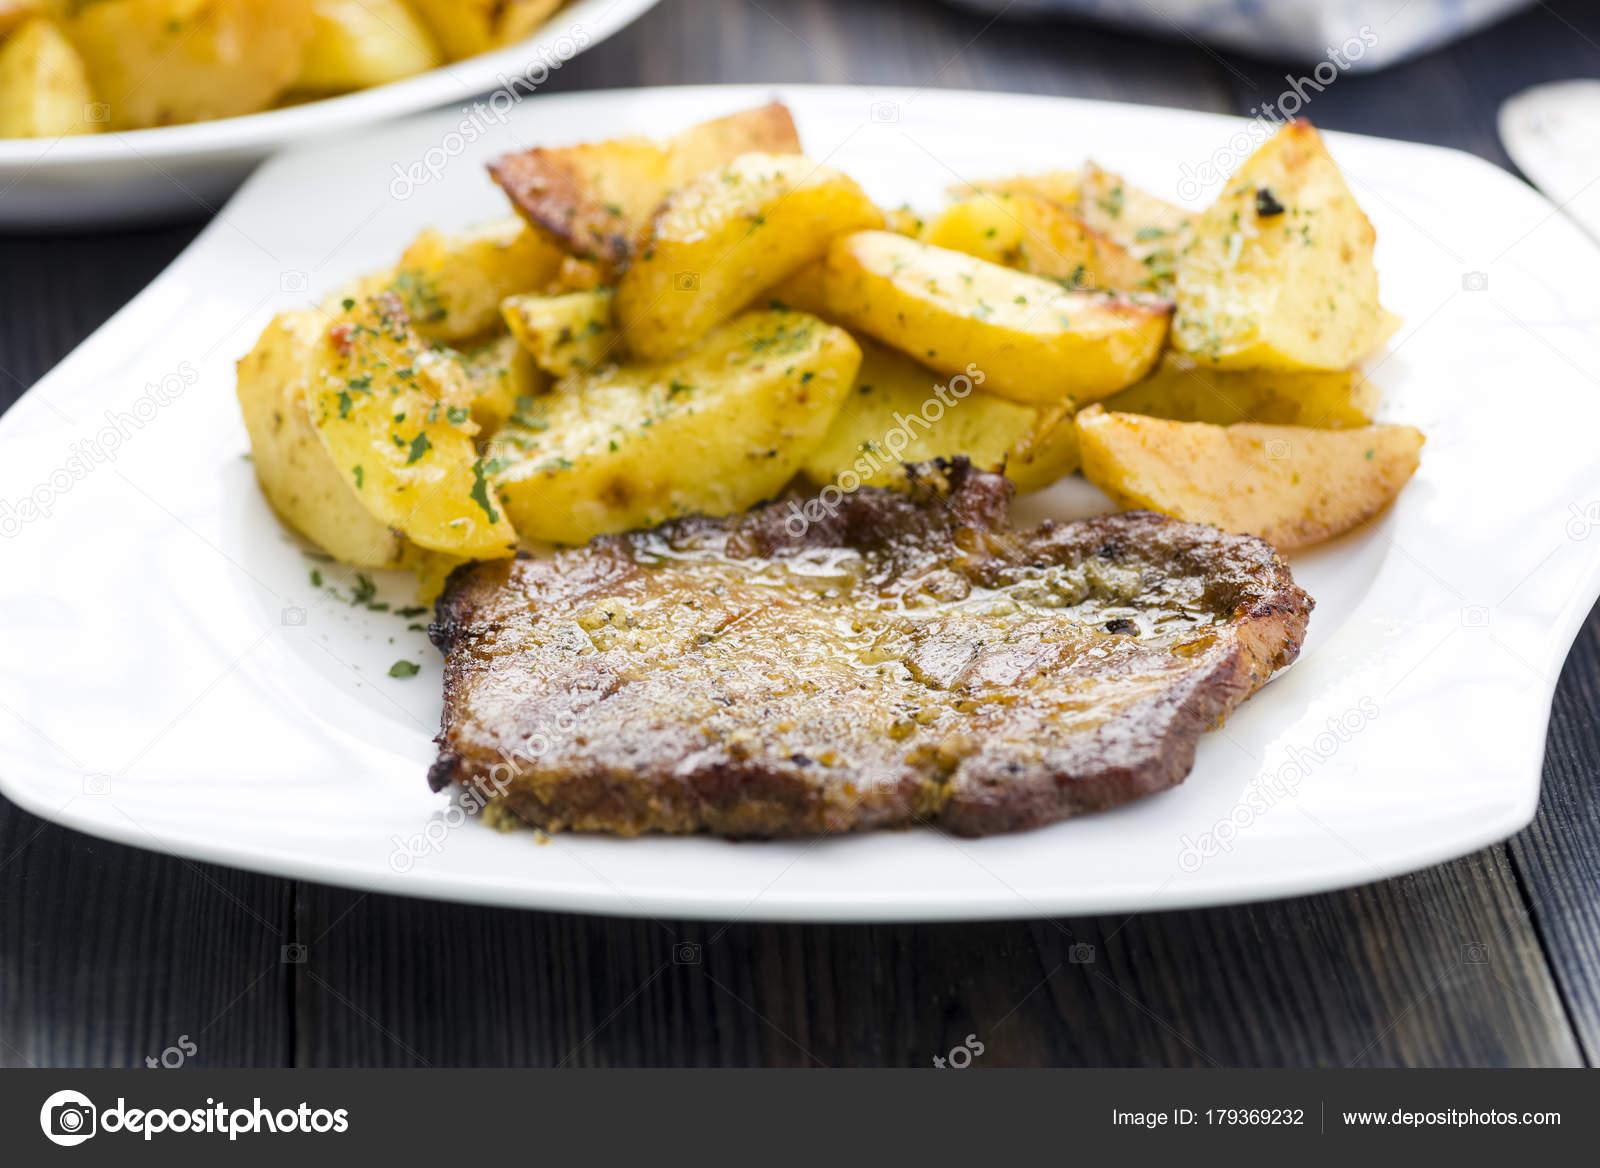 Patates ile domuz kızartma